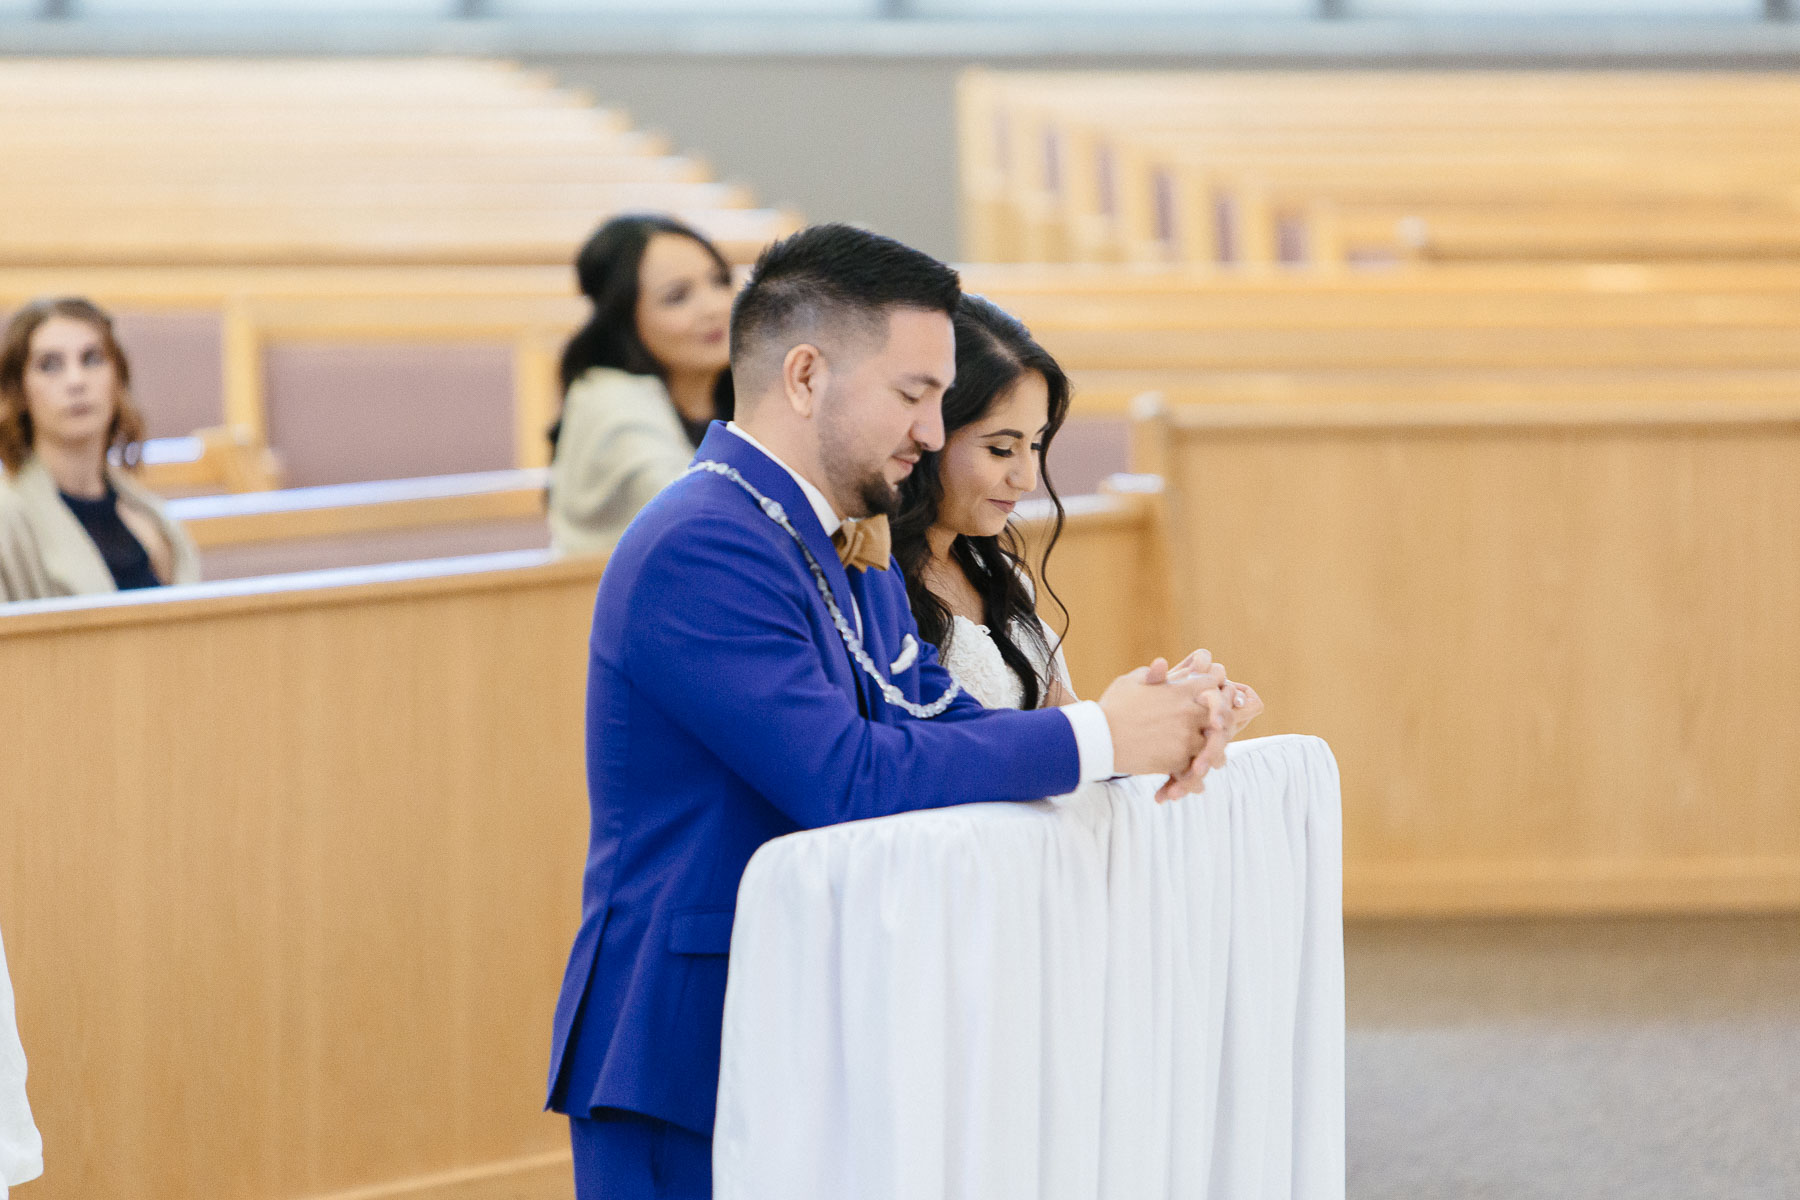 161029-Luxium-Weddings-Arizona-Jeff-Griselda-First-Look-Val-Vista-Lakes-Gilber-041.jpg